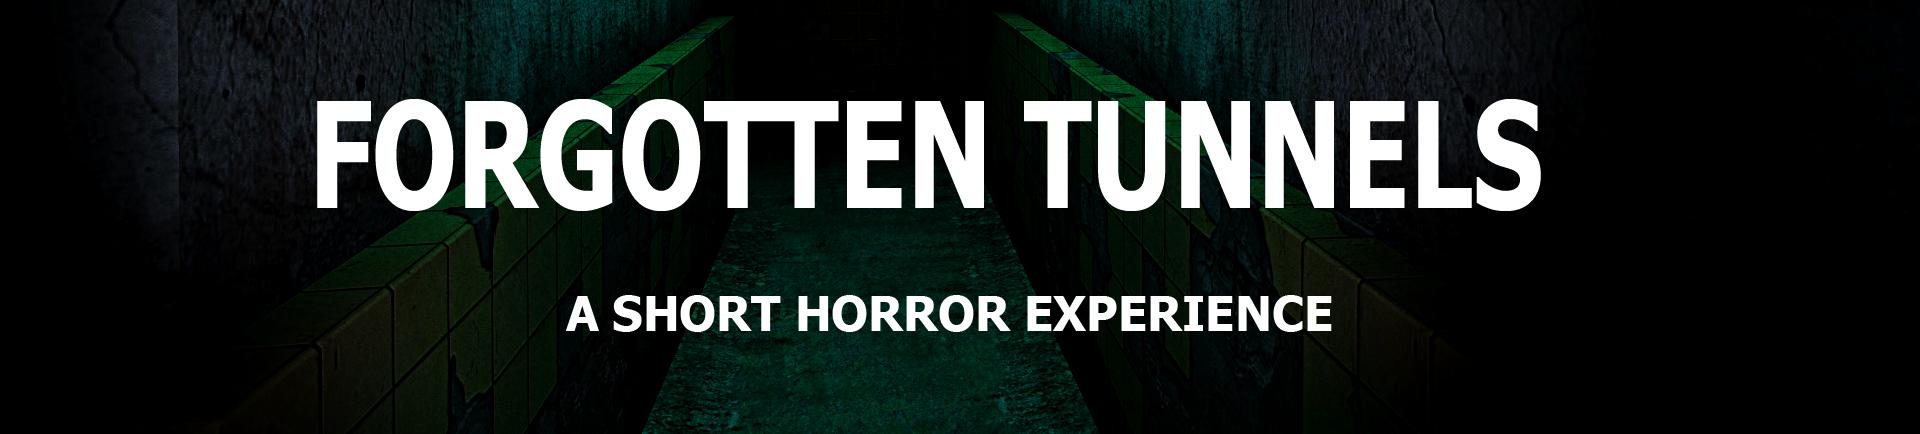 Forgotten Tunnels - Episode 1